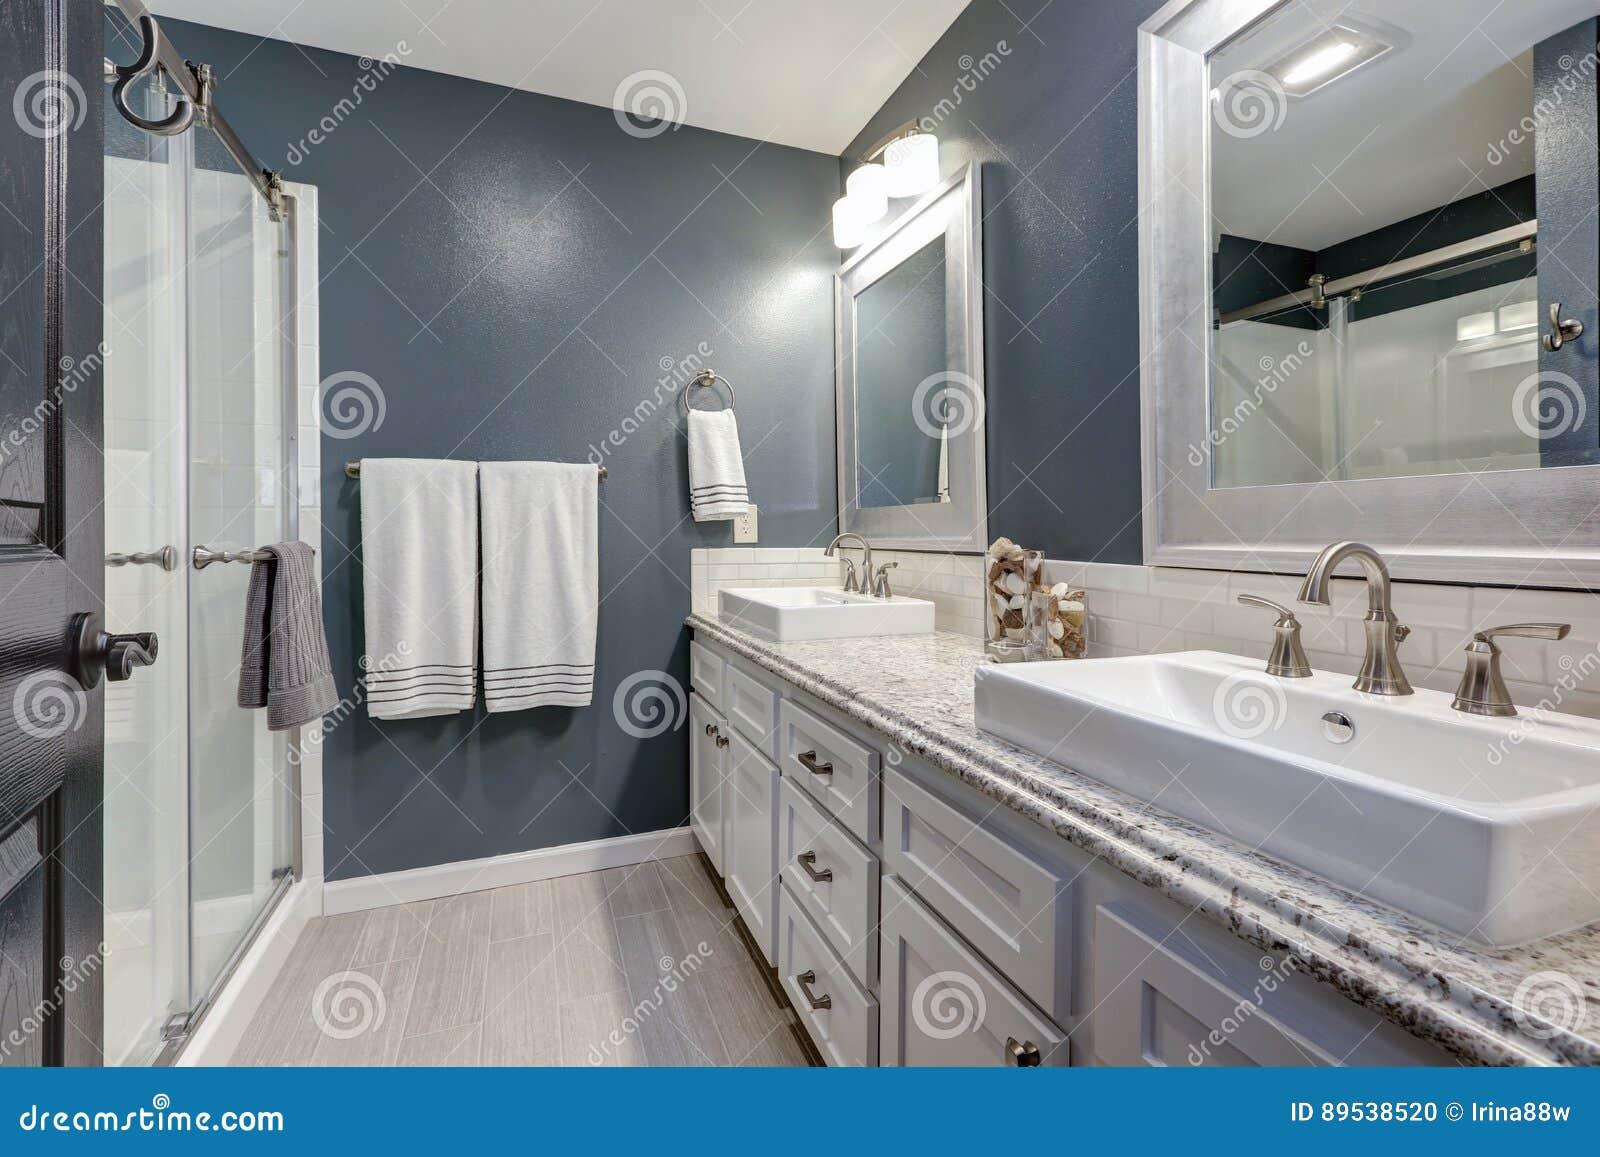 I svit badrum med perfekt design